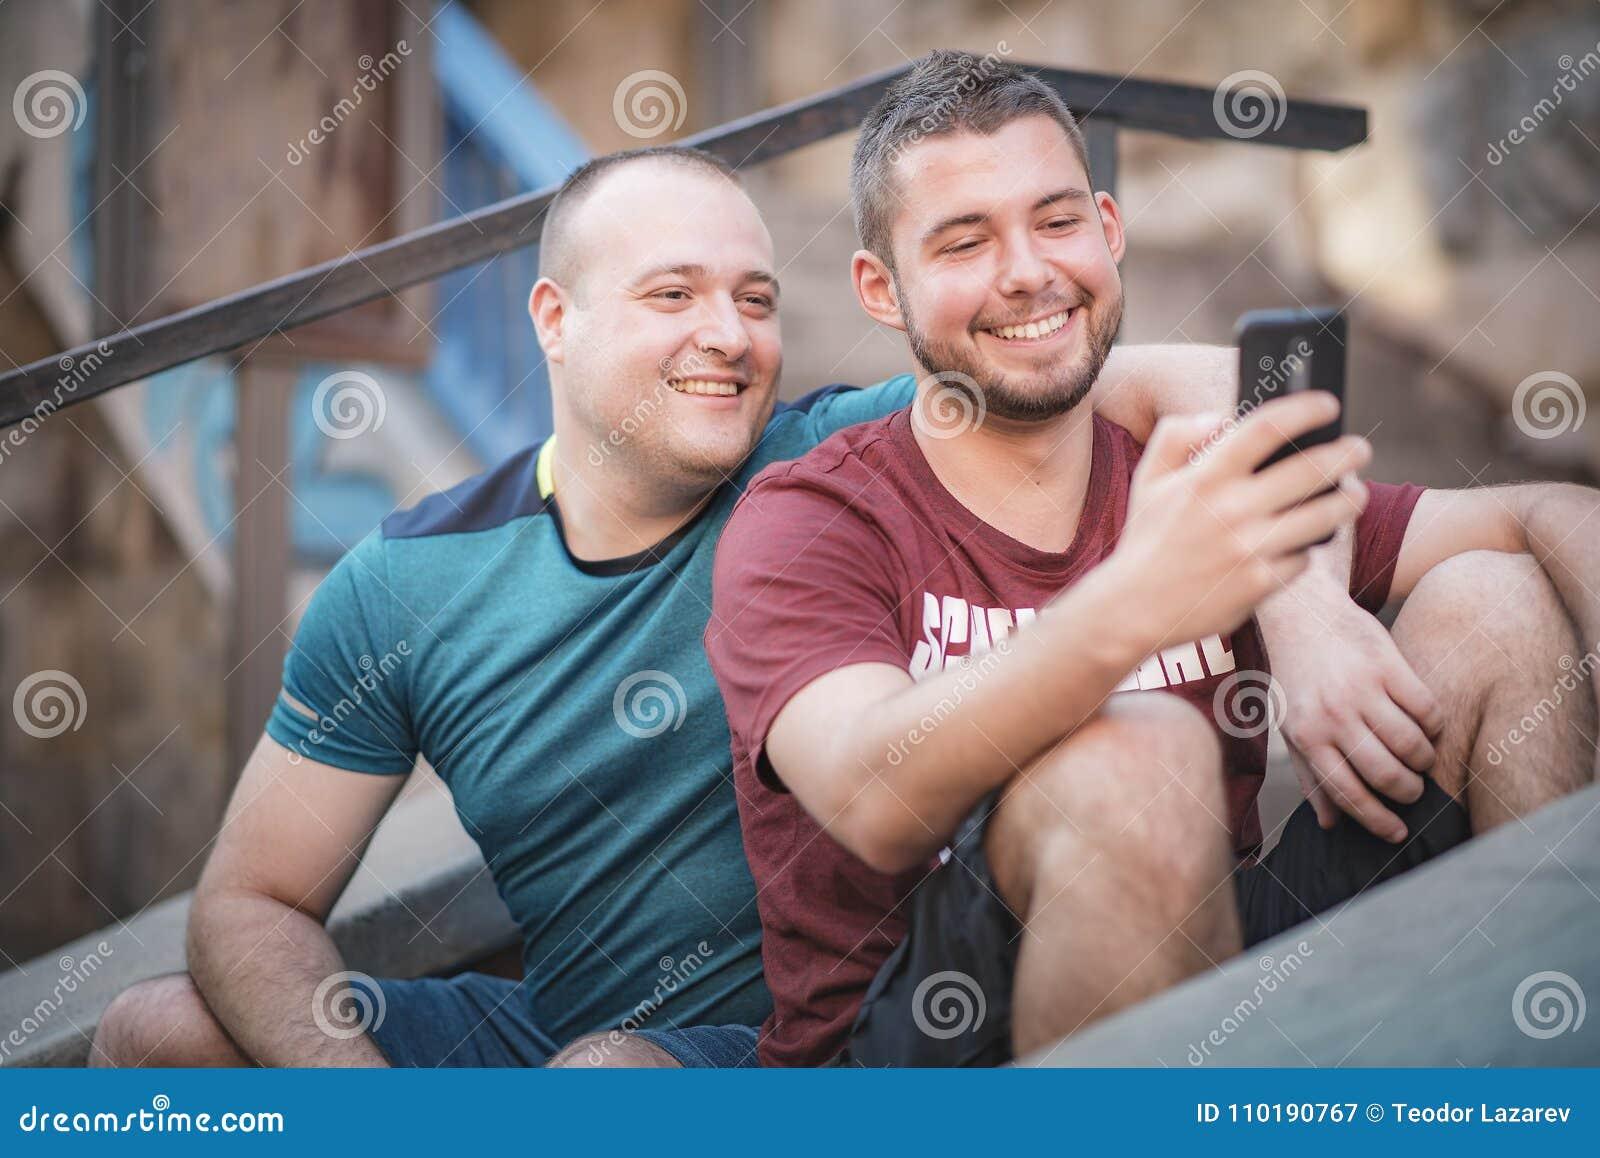 dtr online dating